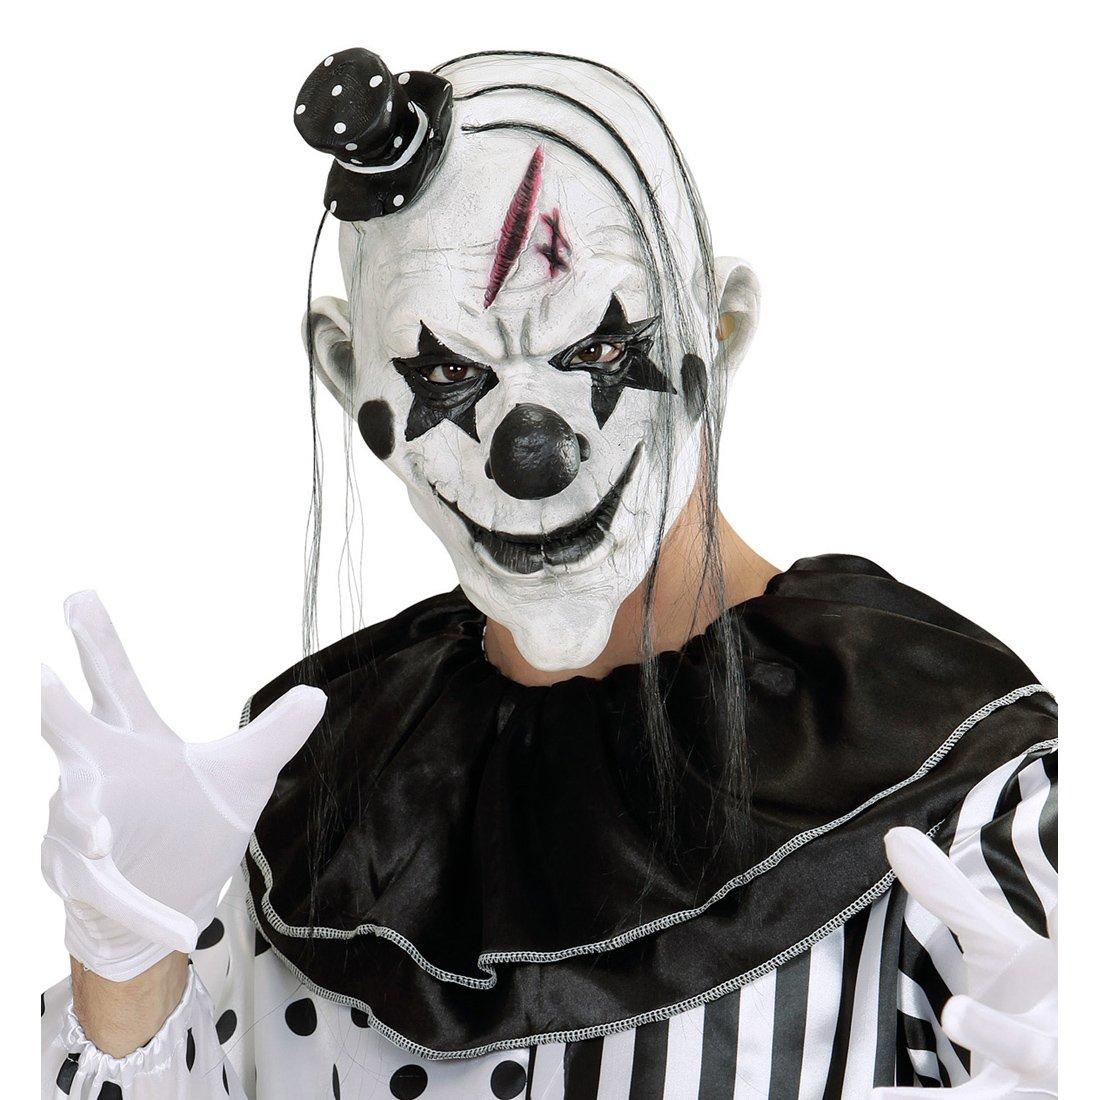 Halloween Maschere.Joker Maschera Clown Horror Maschera Con Cappello E Capelli Clown